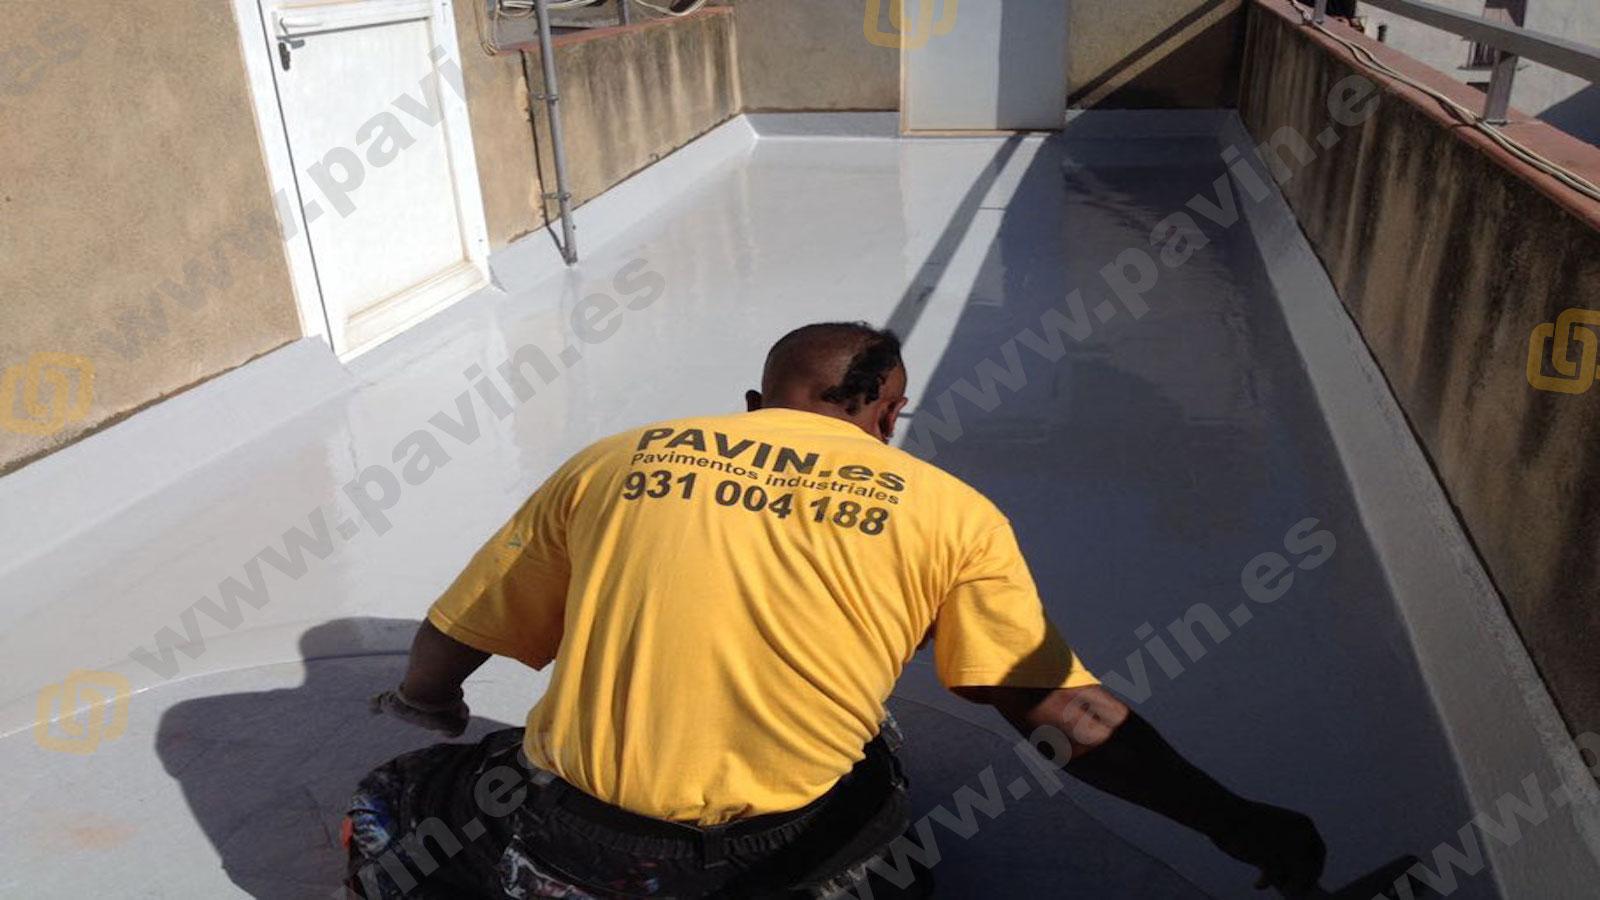 GRUPO PAVIN - Pavimentos industriales | 3 tipos de resina para pavimentos industriales explicados brevemente| Seleccionar el pavimento de resina correcto